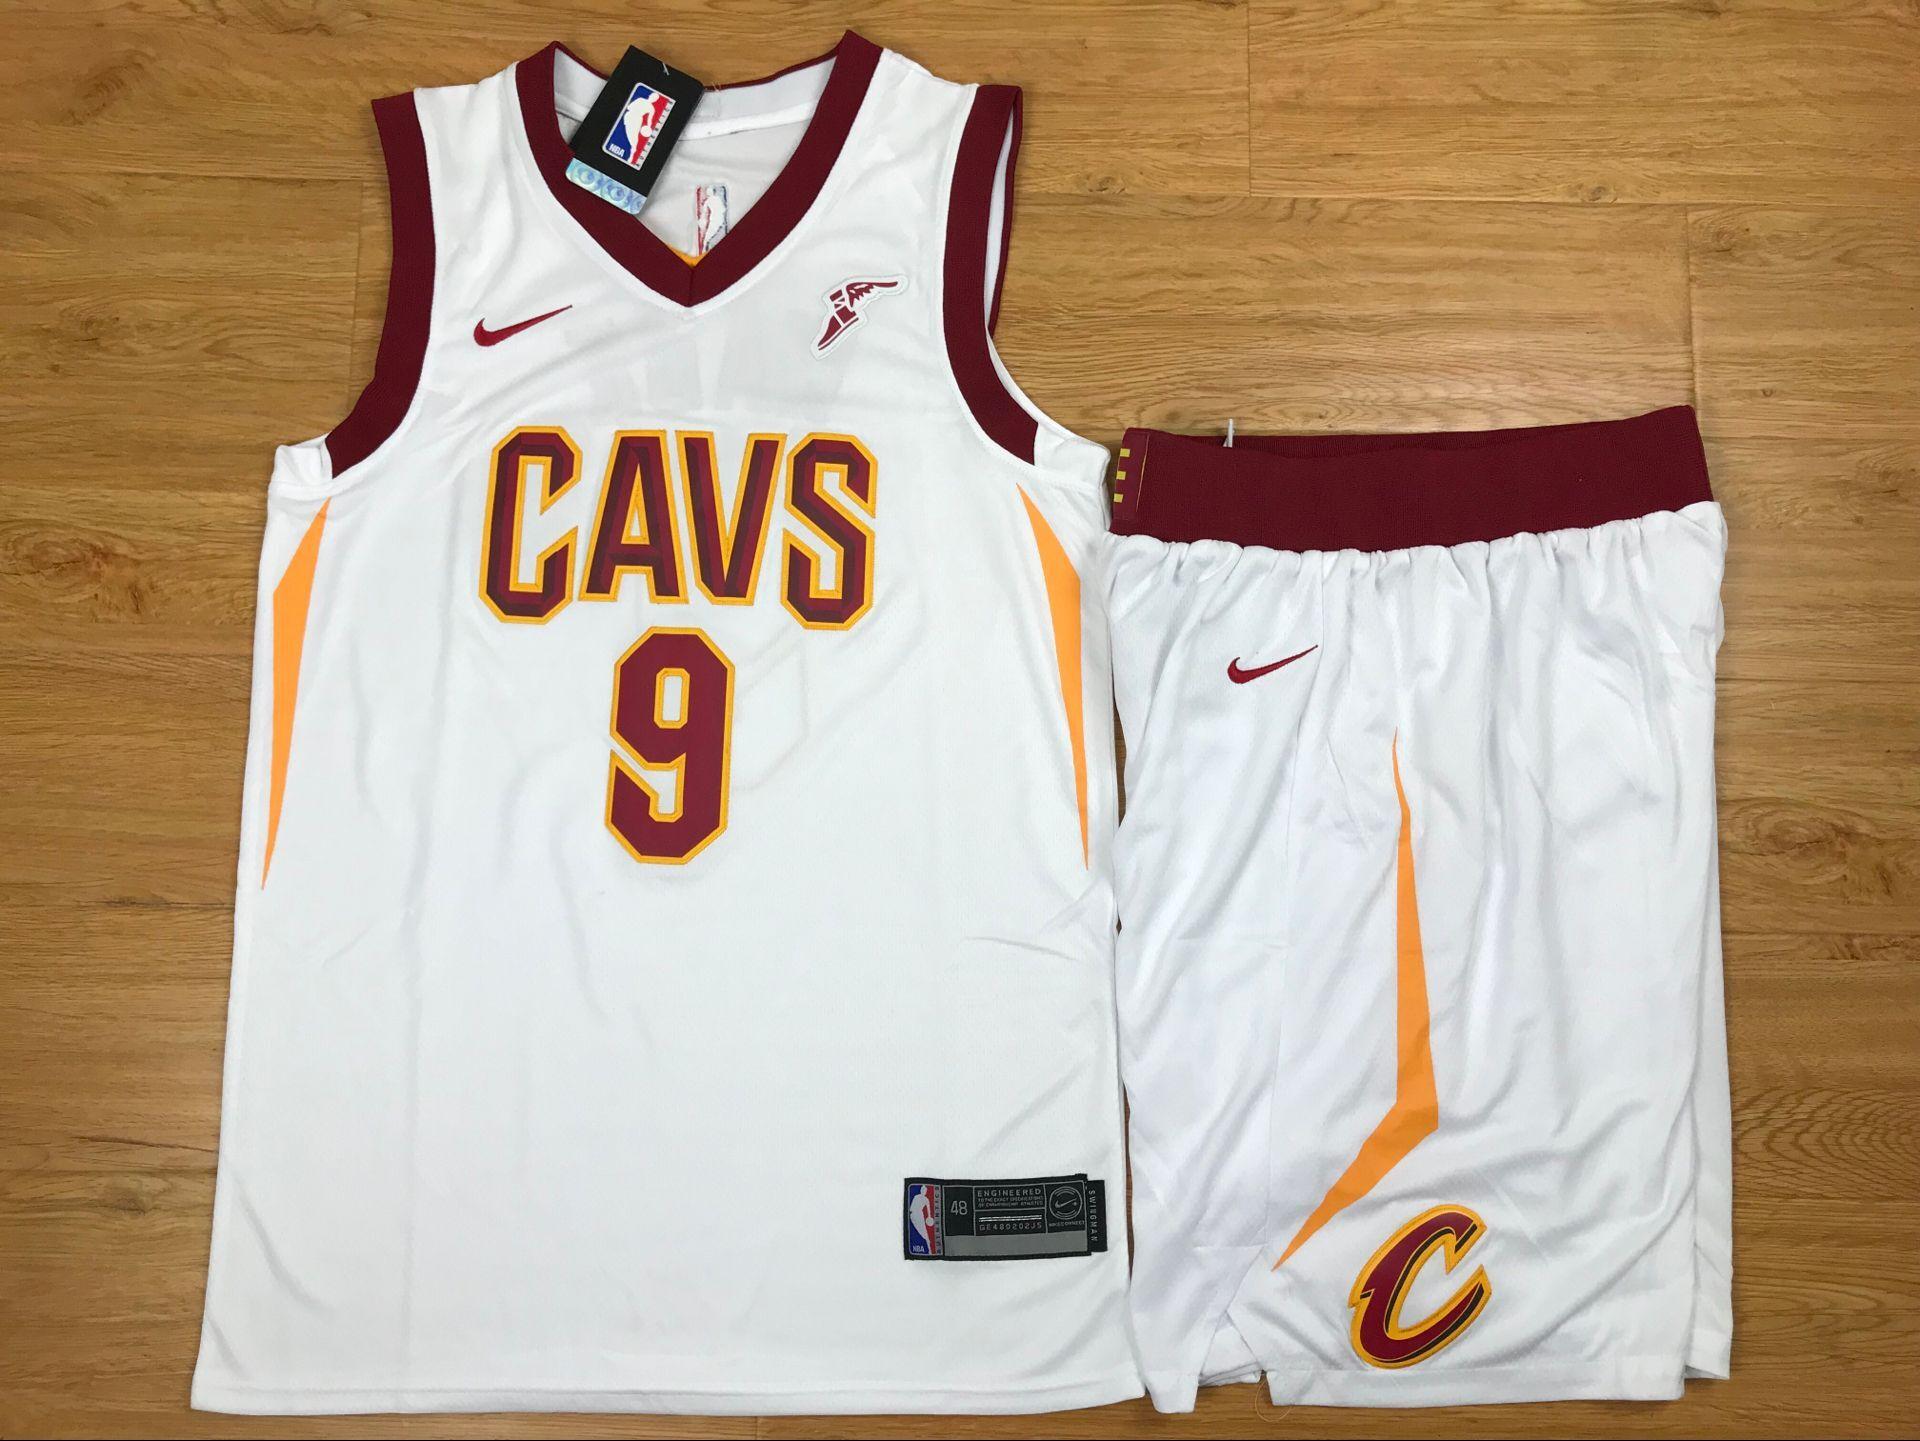 Cavaliers 9 Dwyane Wade White Nike Swingman Jersey(With Shorts)